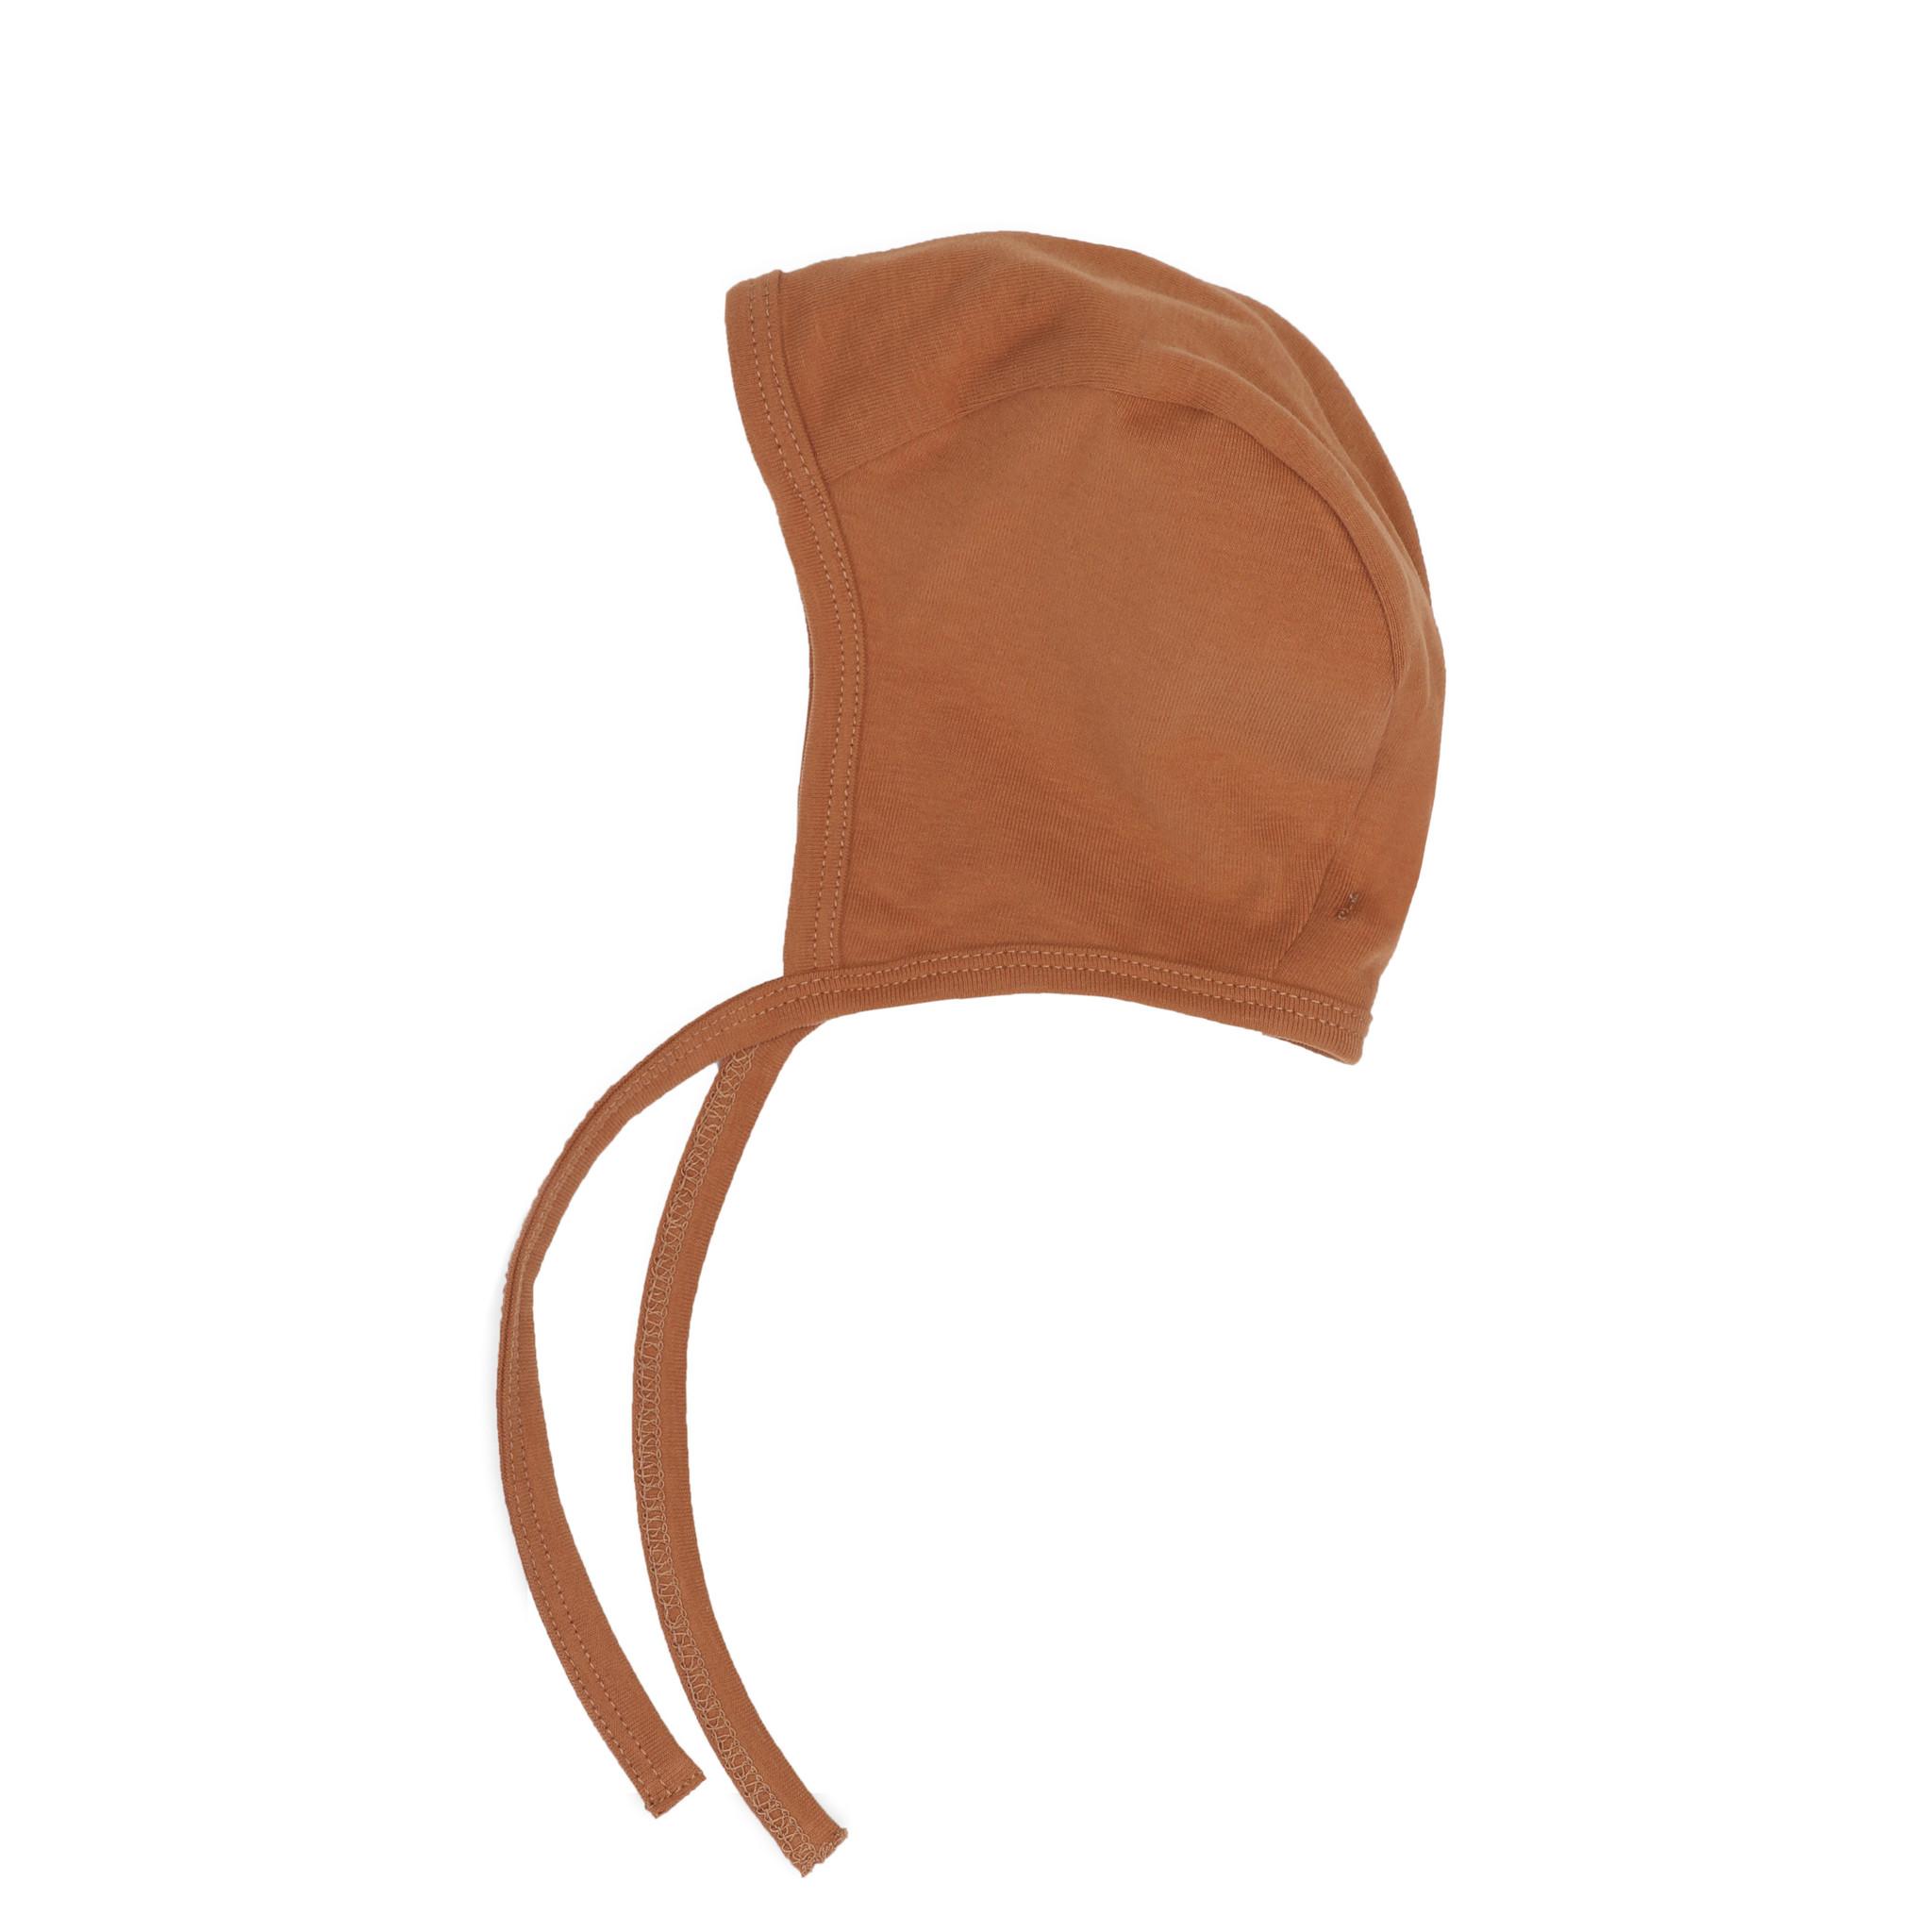 Baby bonnet - Hazel-1